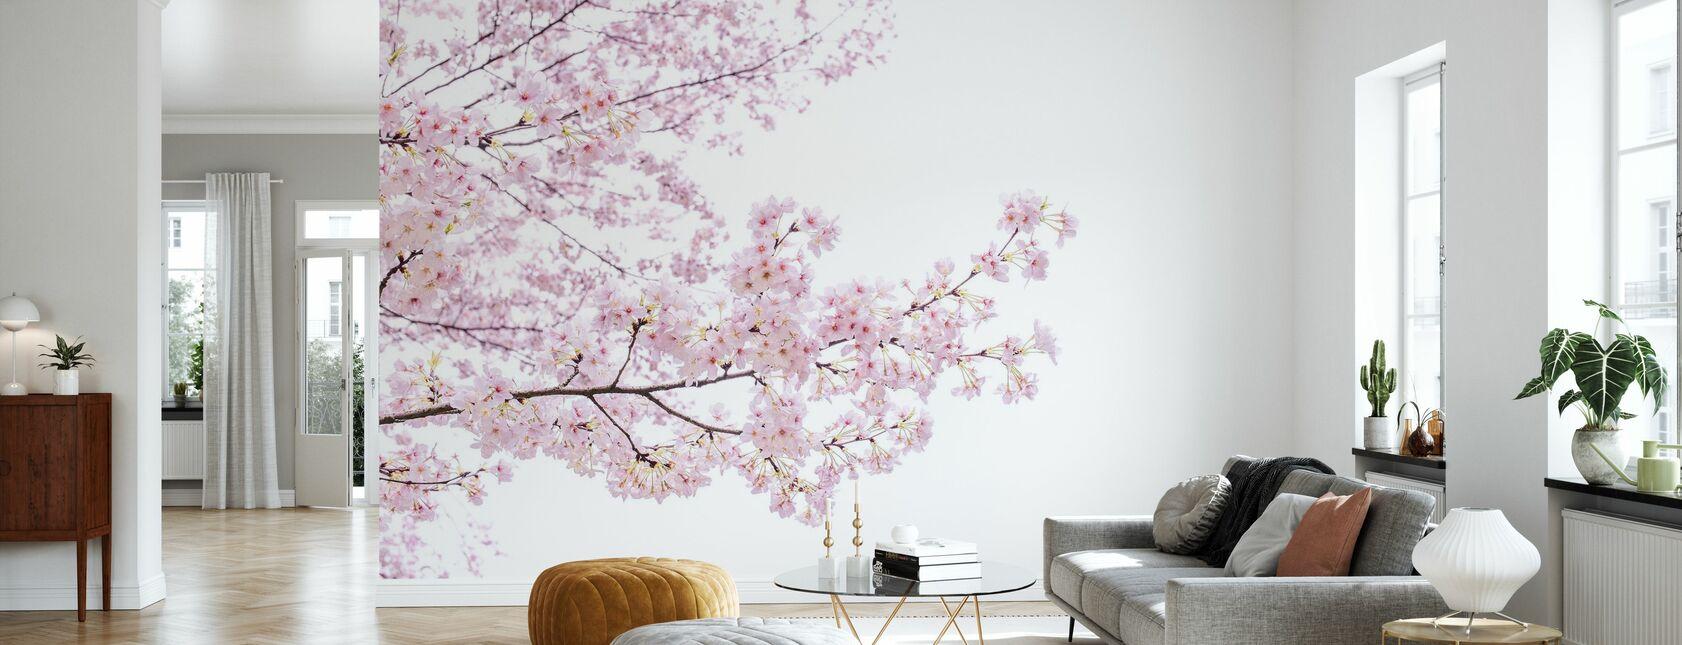 Divine Cherry Blossoms - Wallpaper - Living Room